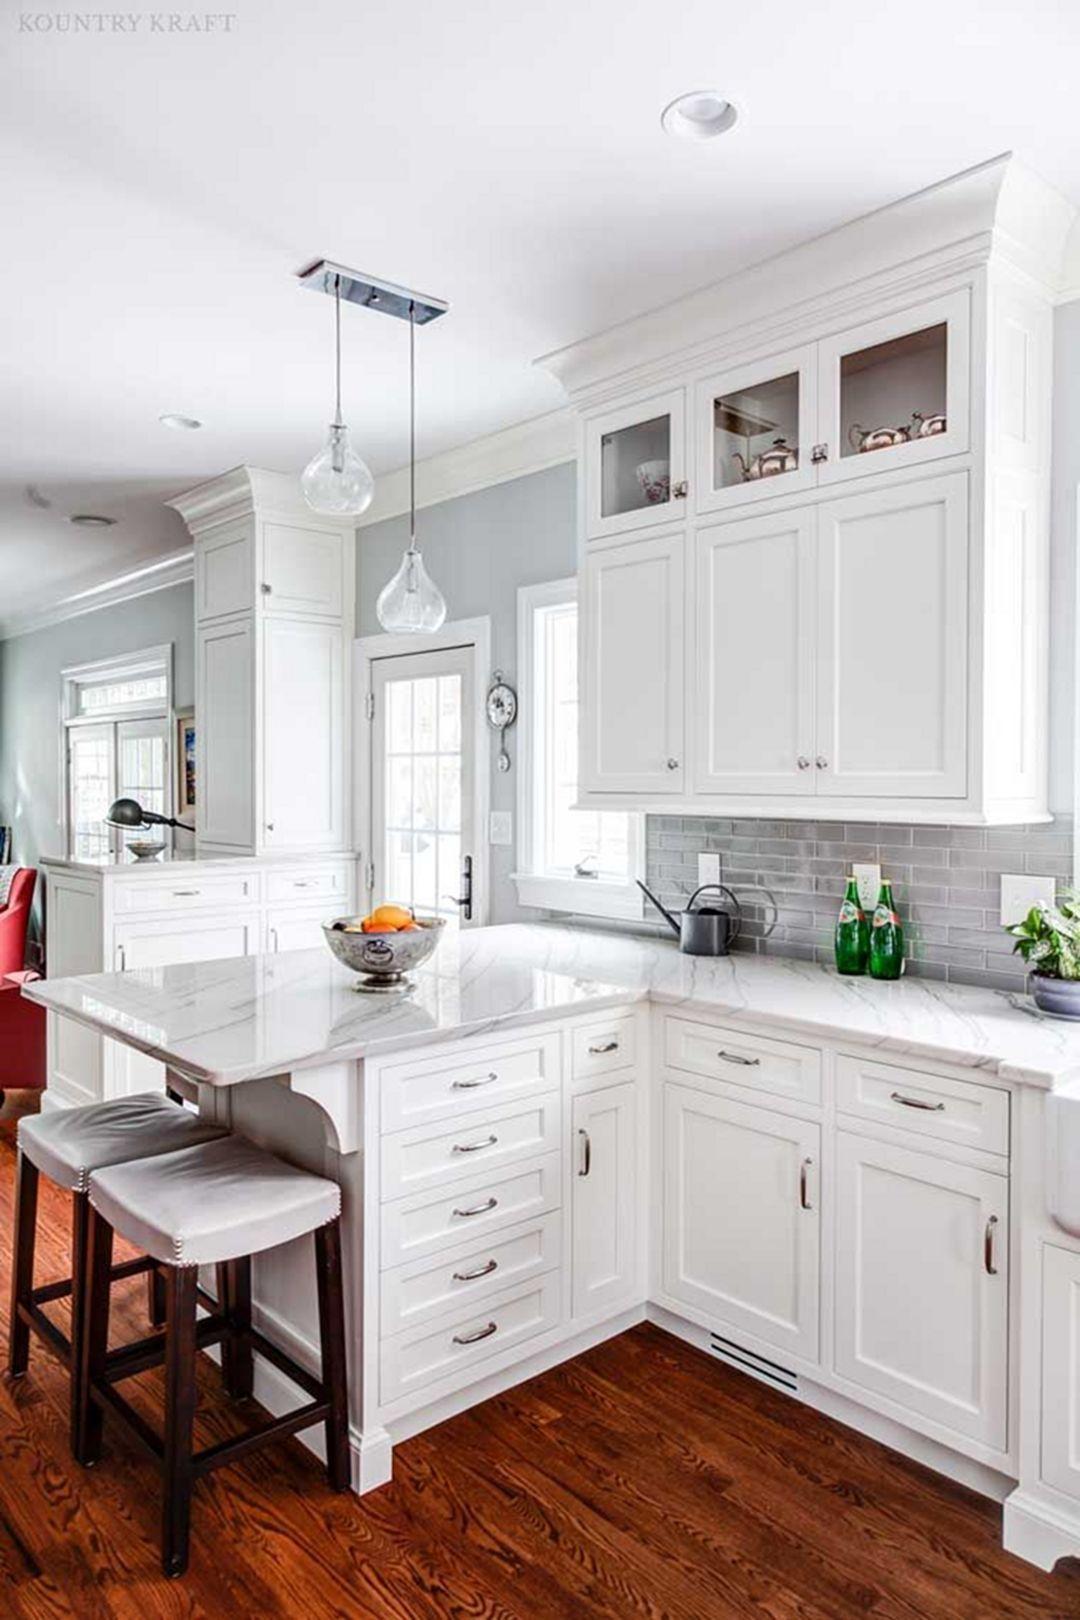 30 Comfortable White Kitchen Color Schemes That Will Make Your Kitchen More Brighten Modern White Kitchen Cabinets White Modern Kitchen Custom Kitchen Cabinets